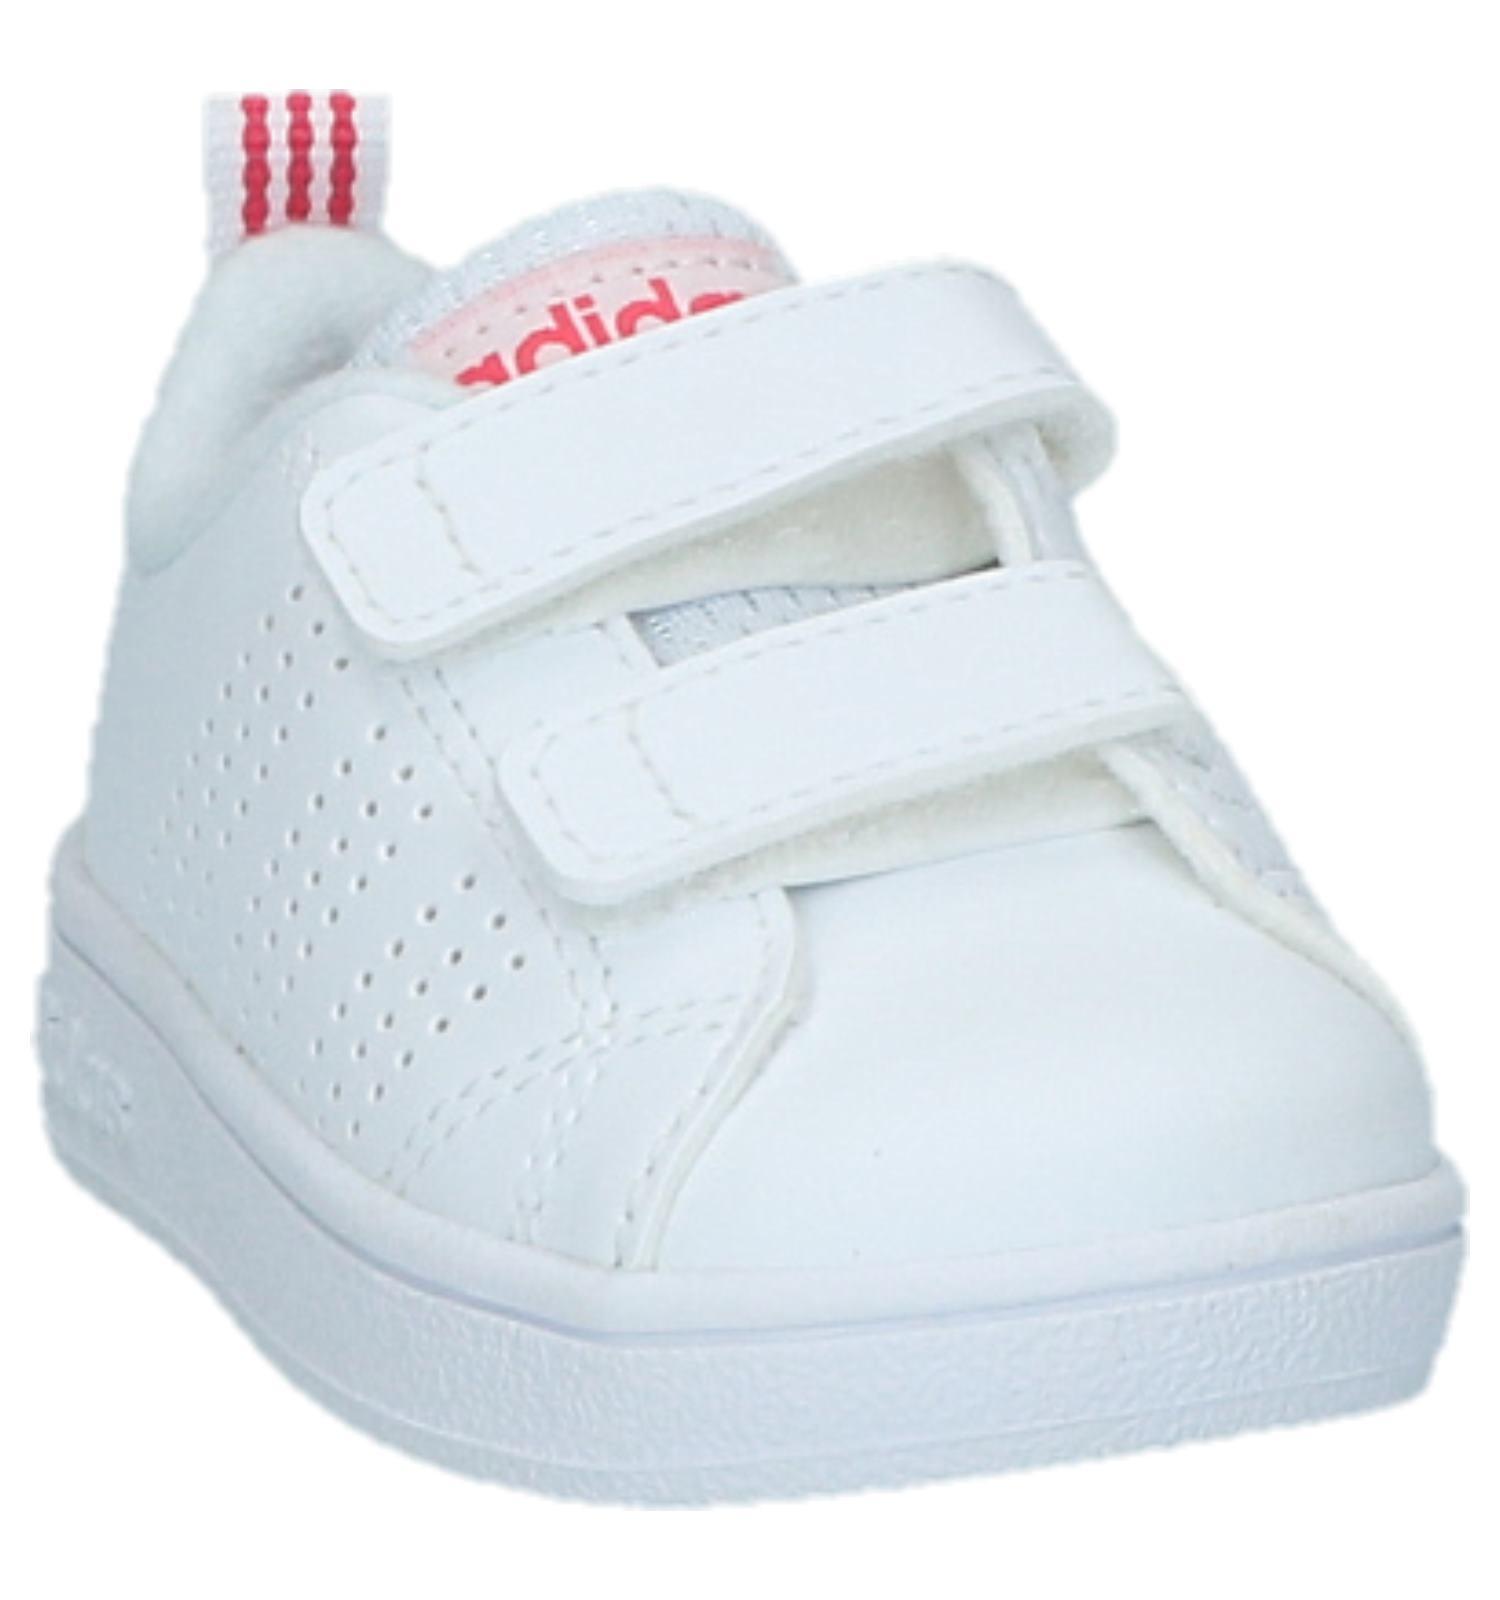 c60e5aba25b Witte Babysneakers adidas VS Advantage Clean | SCHOENENTORFS.NL | Gratis  verzend en retour